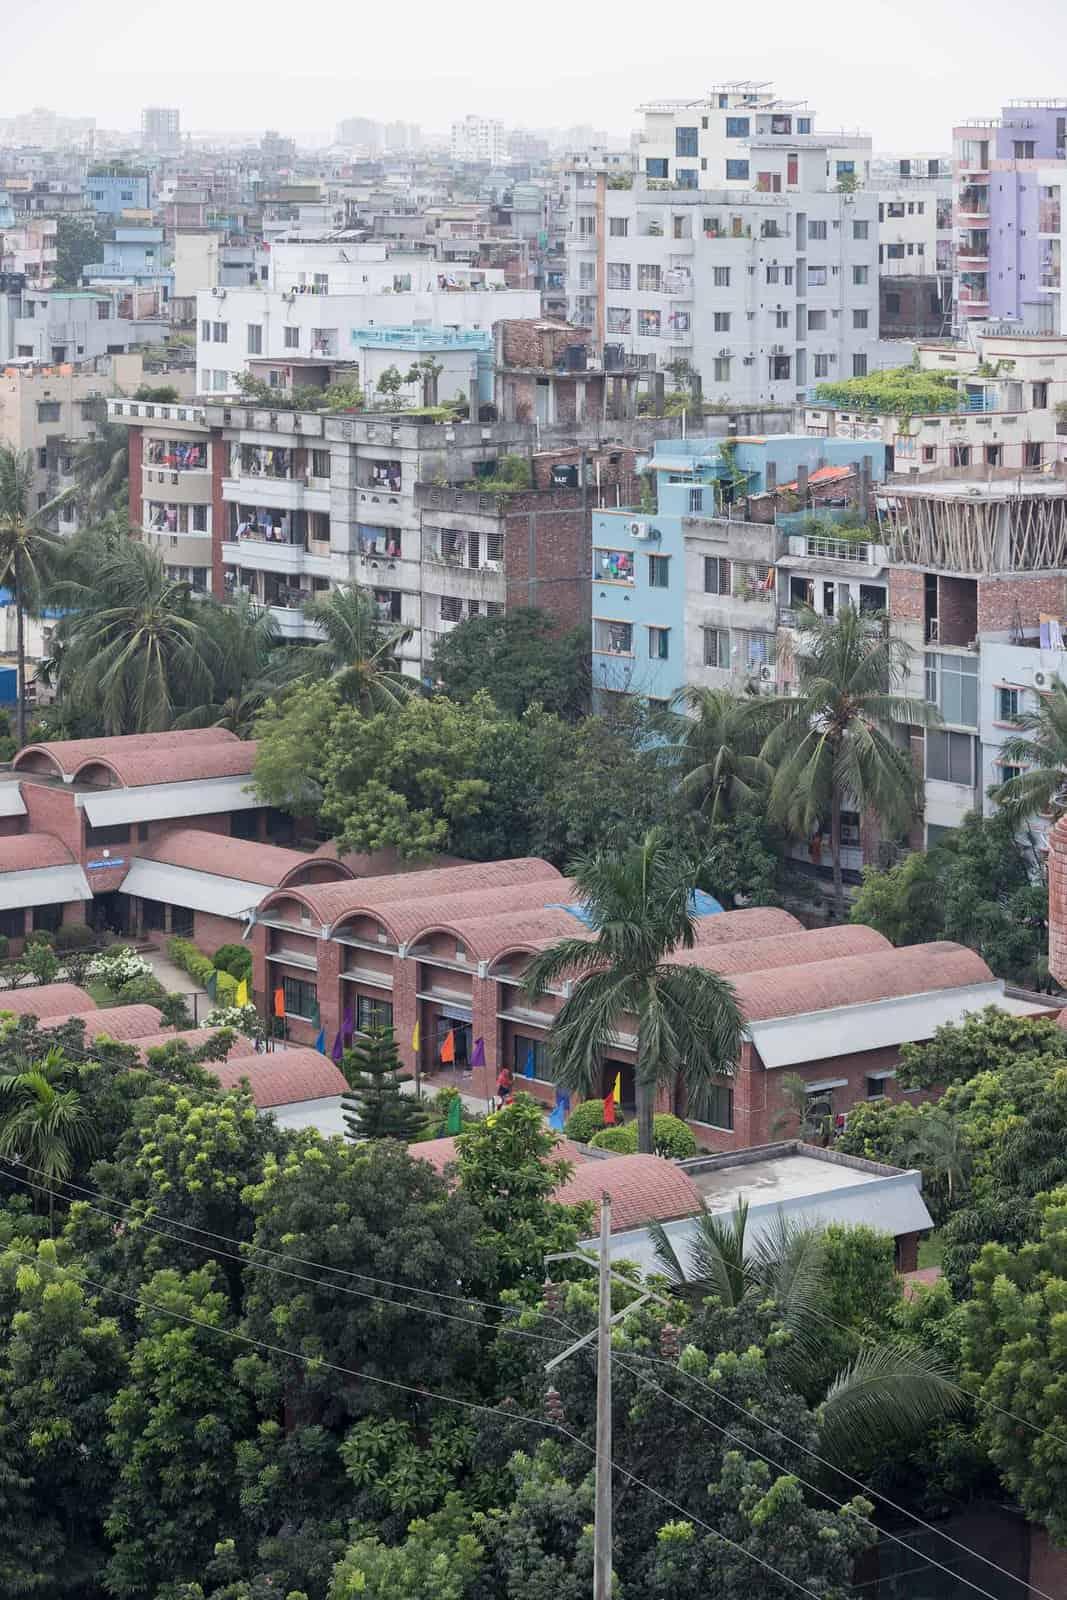 SOS Youth Village and Vocational Centre \ Mirpur, Dhaka, Architect: C.A.P.E / Raziul Ahsan \ Copyright: Iwan Baan